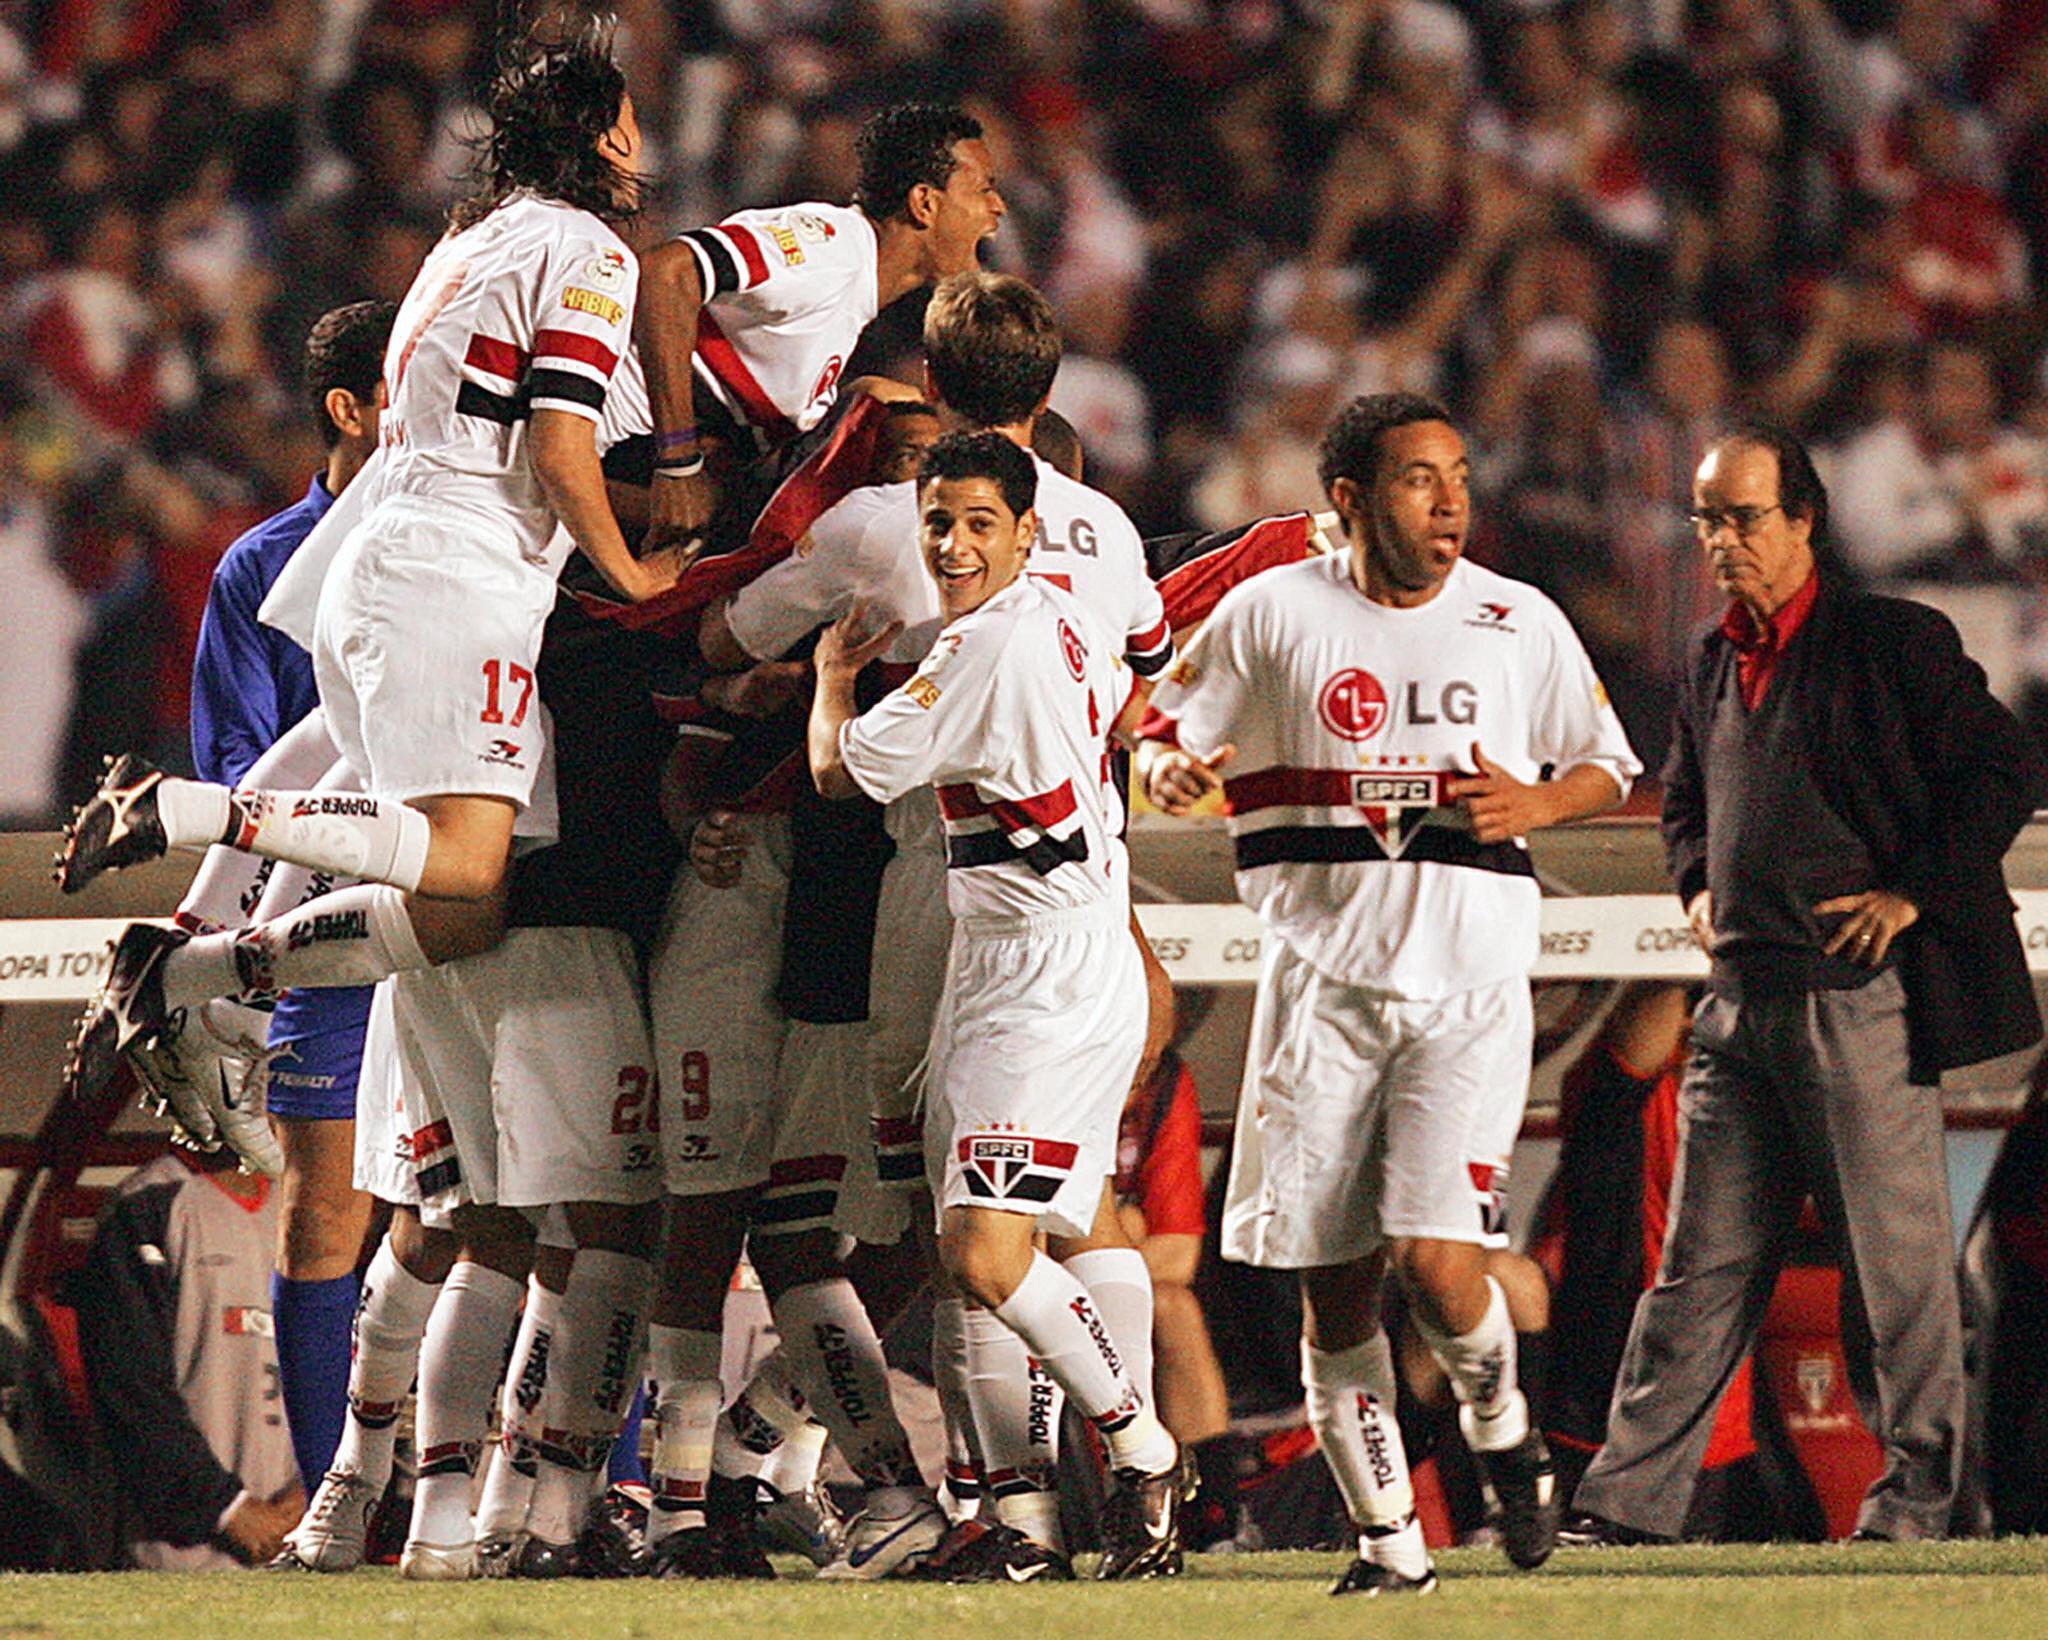 Sao-Paulo-players-celebrate-with-Amoroso-1568249579.jpg